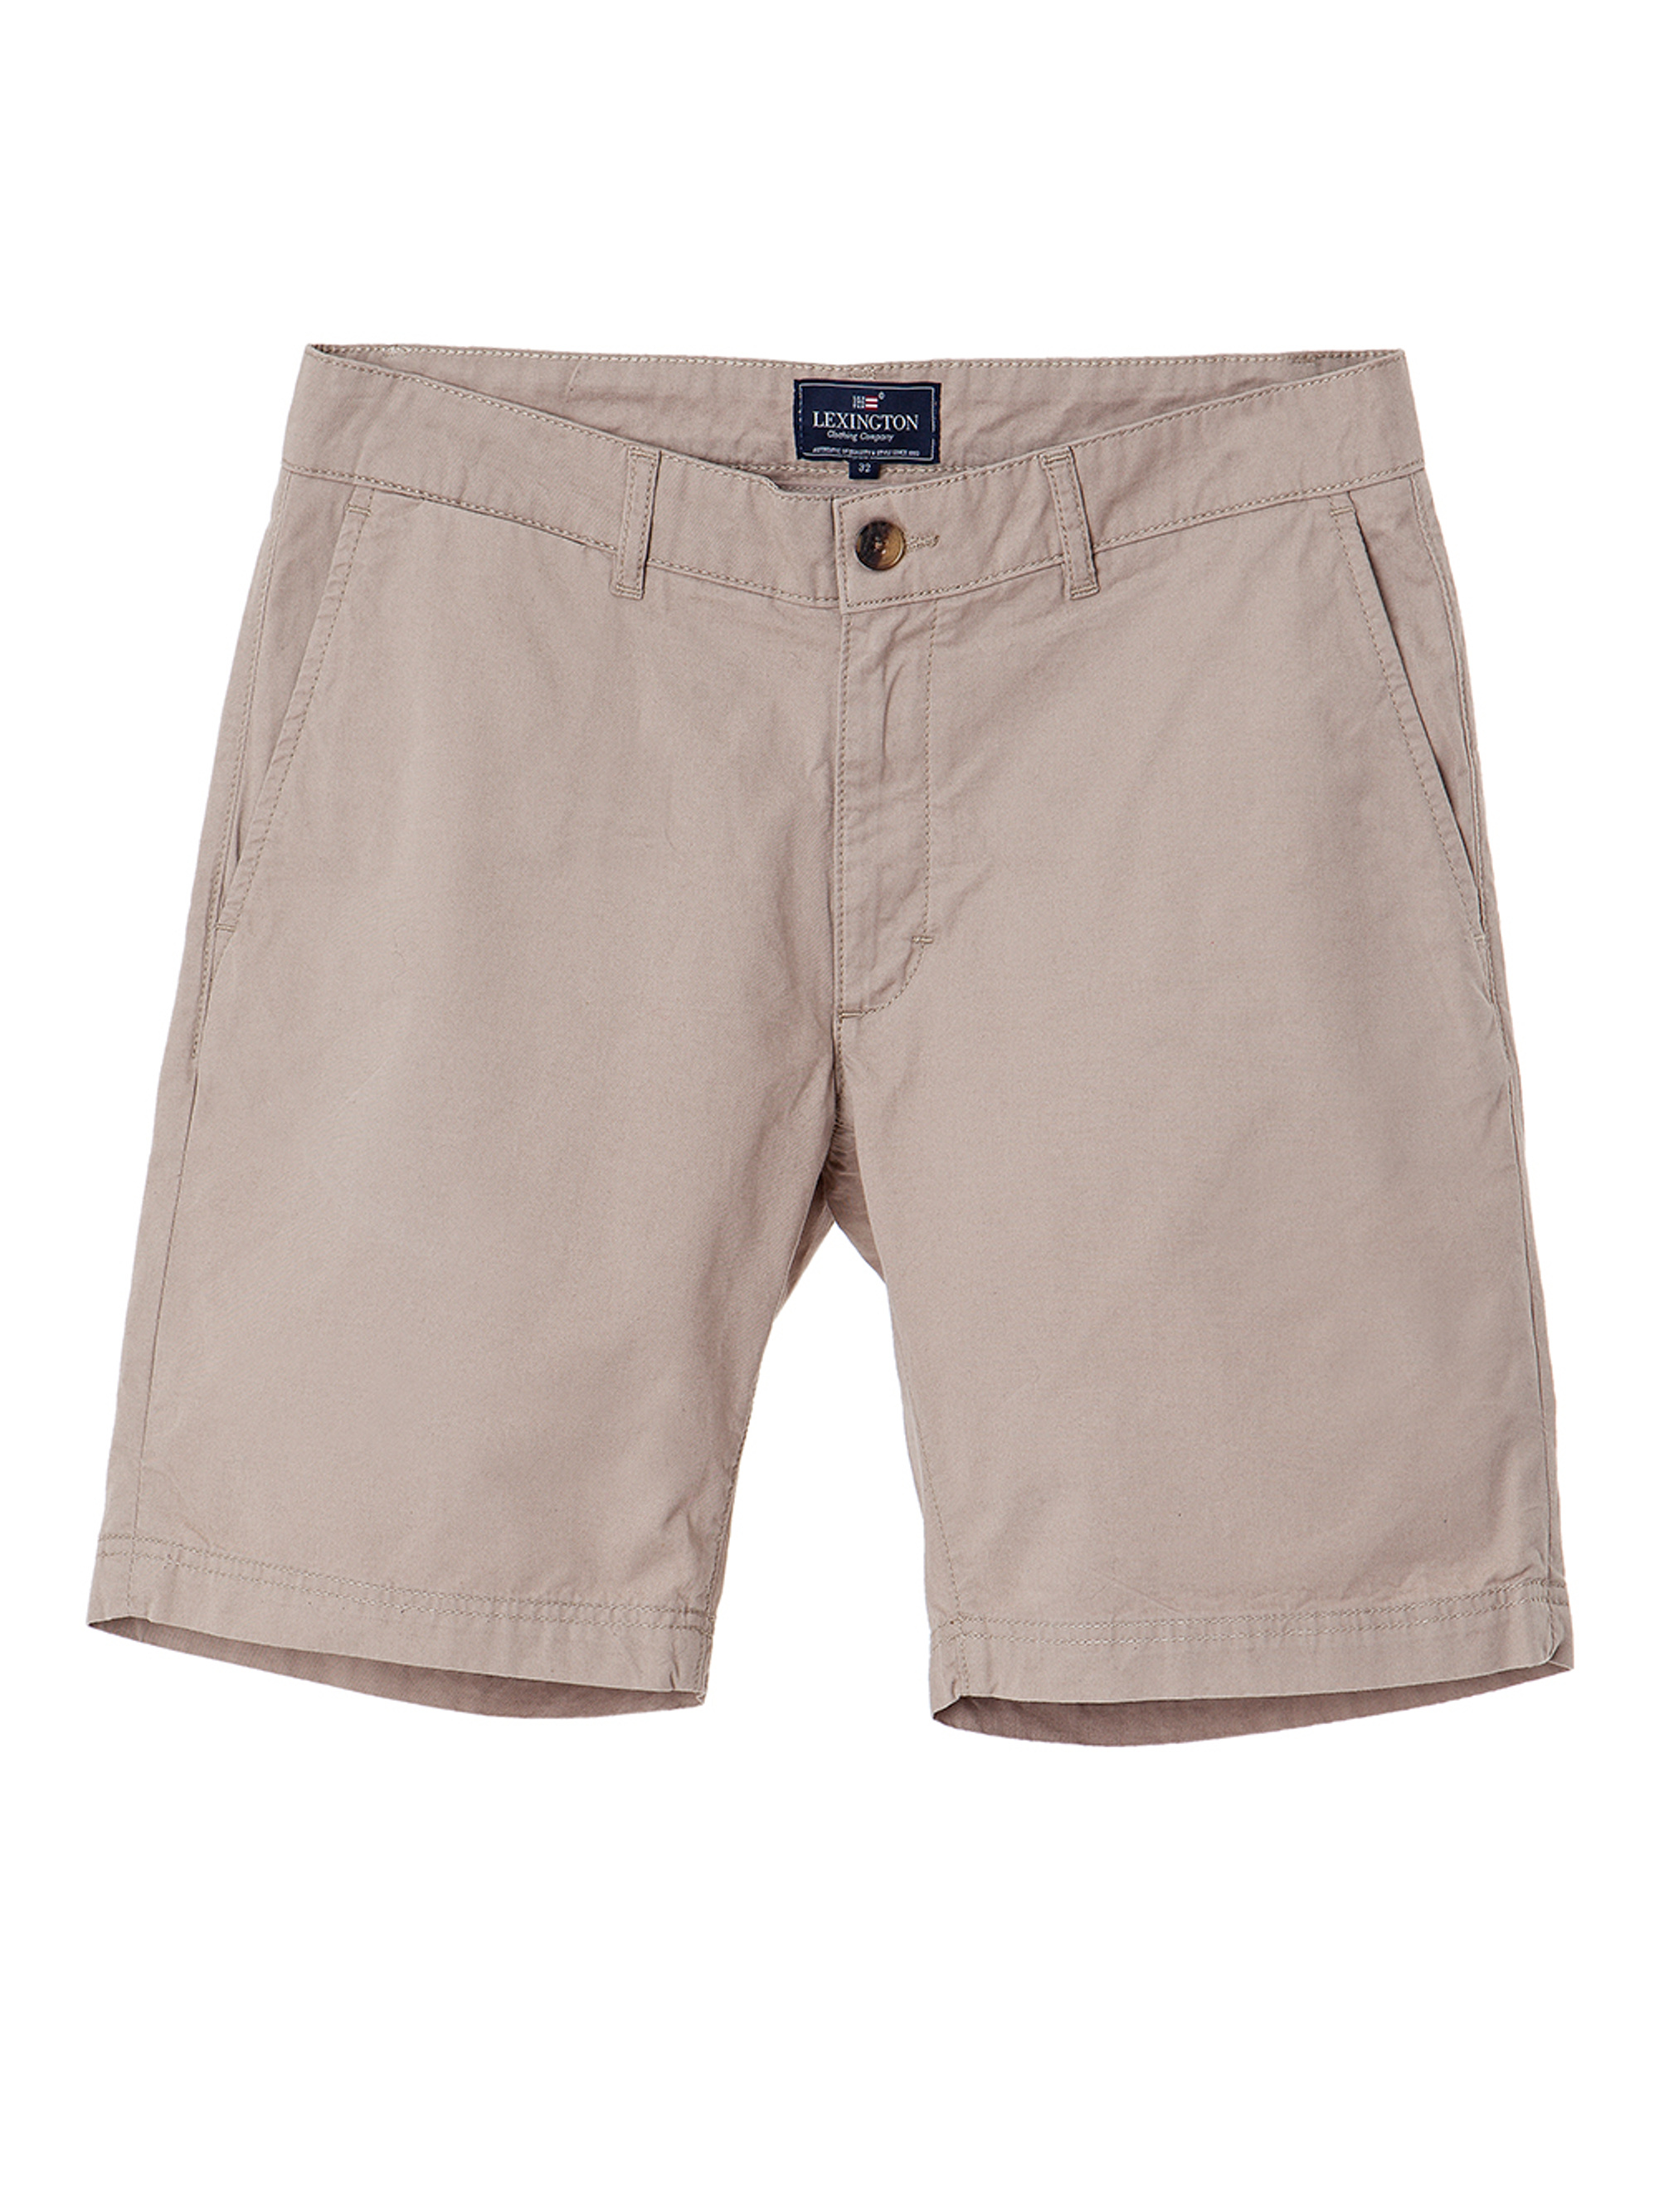 Gavin Chino Shorts, Silver Mink